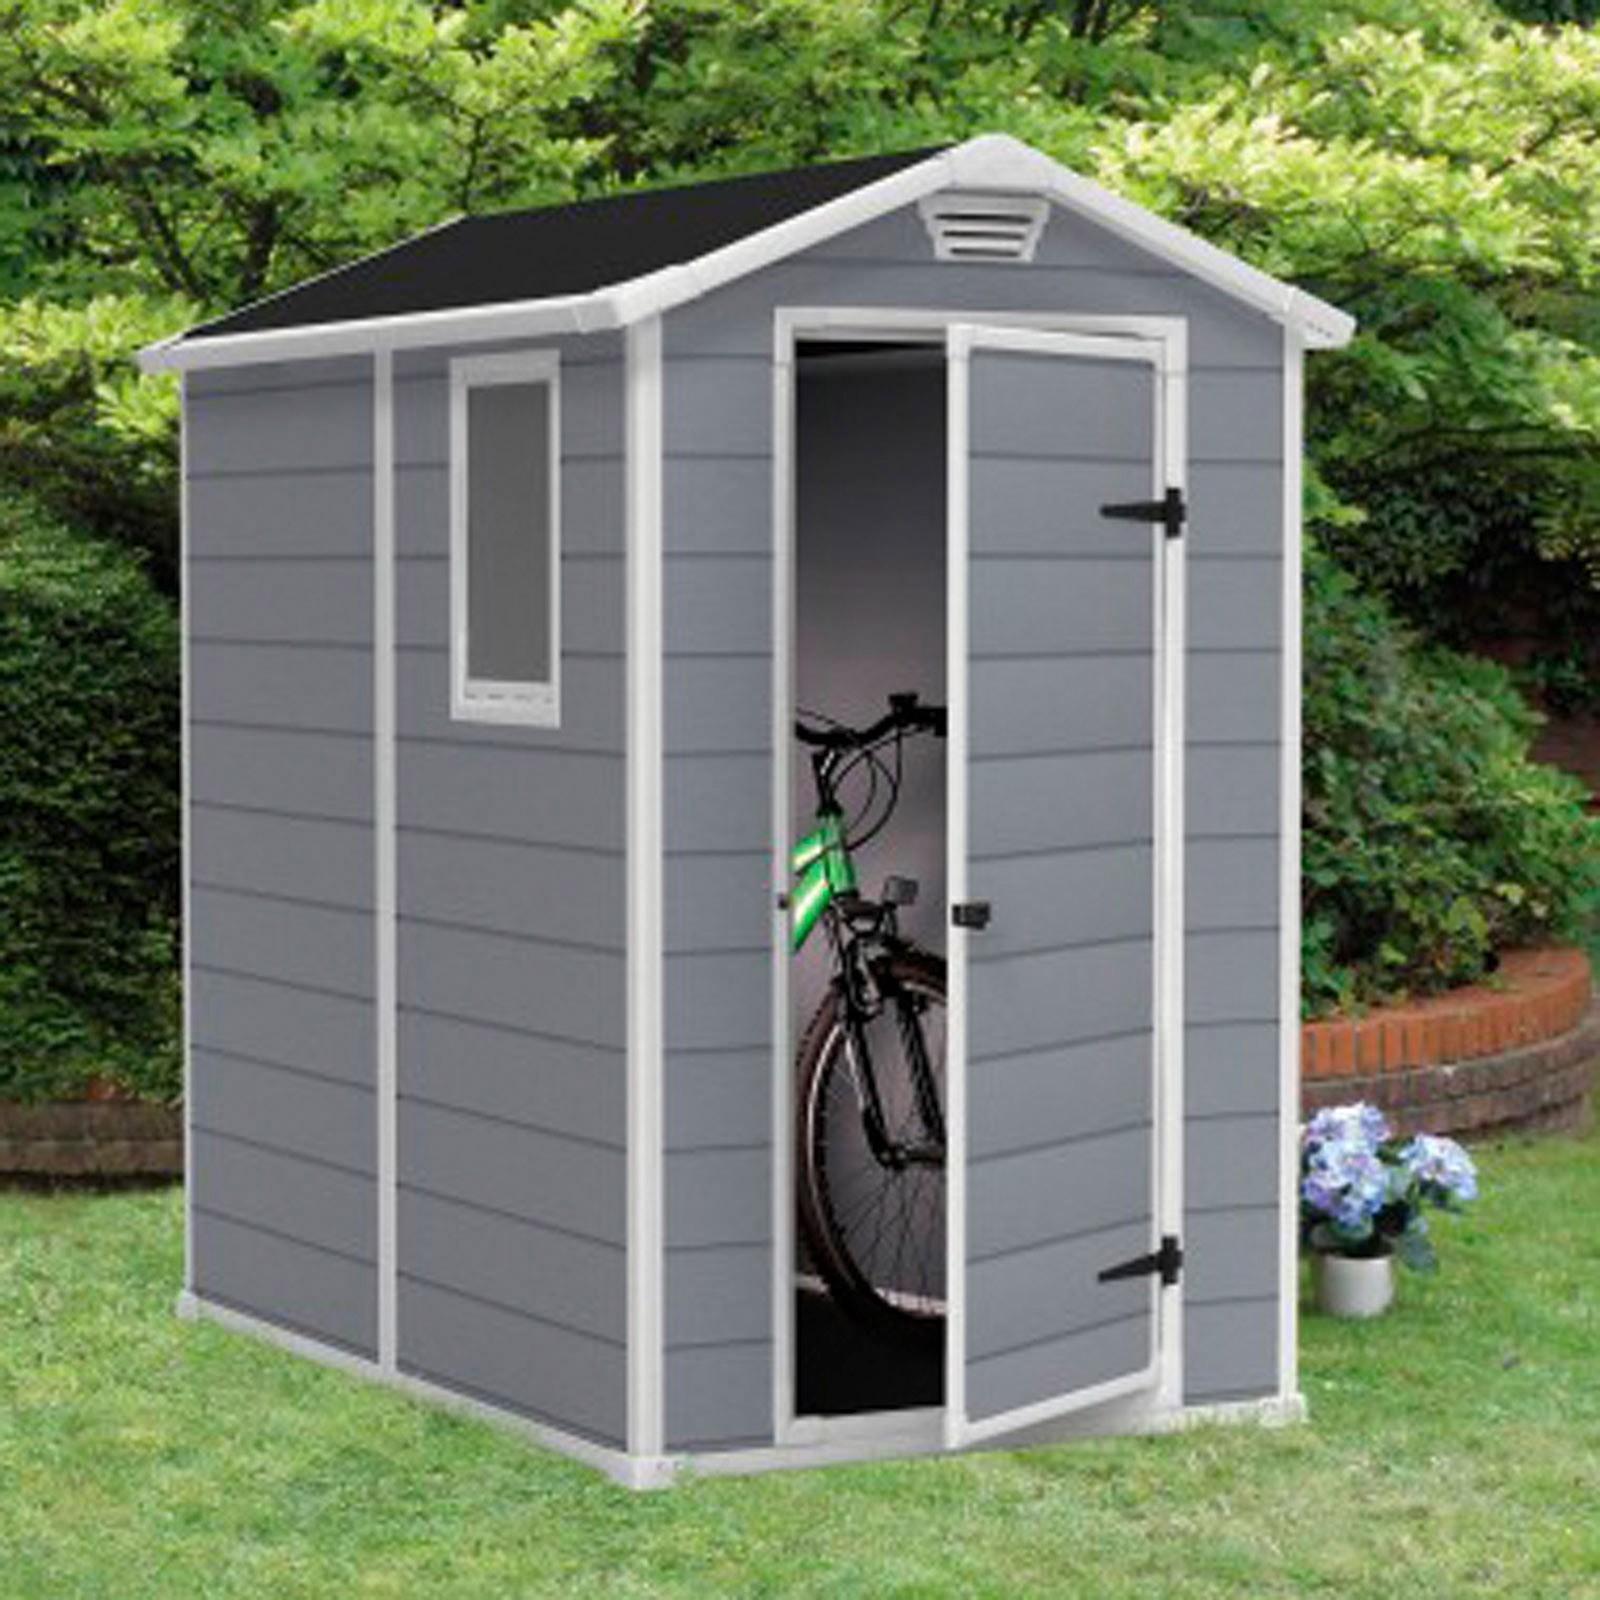 gartenhaus 6 qm arkansasgreenguide. Black Bedroom Furniture Sets. Home Design Ideas